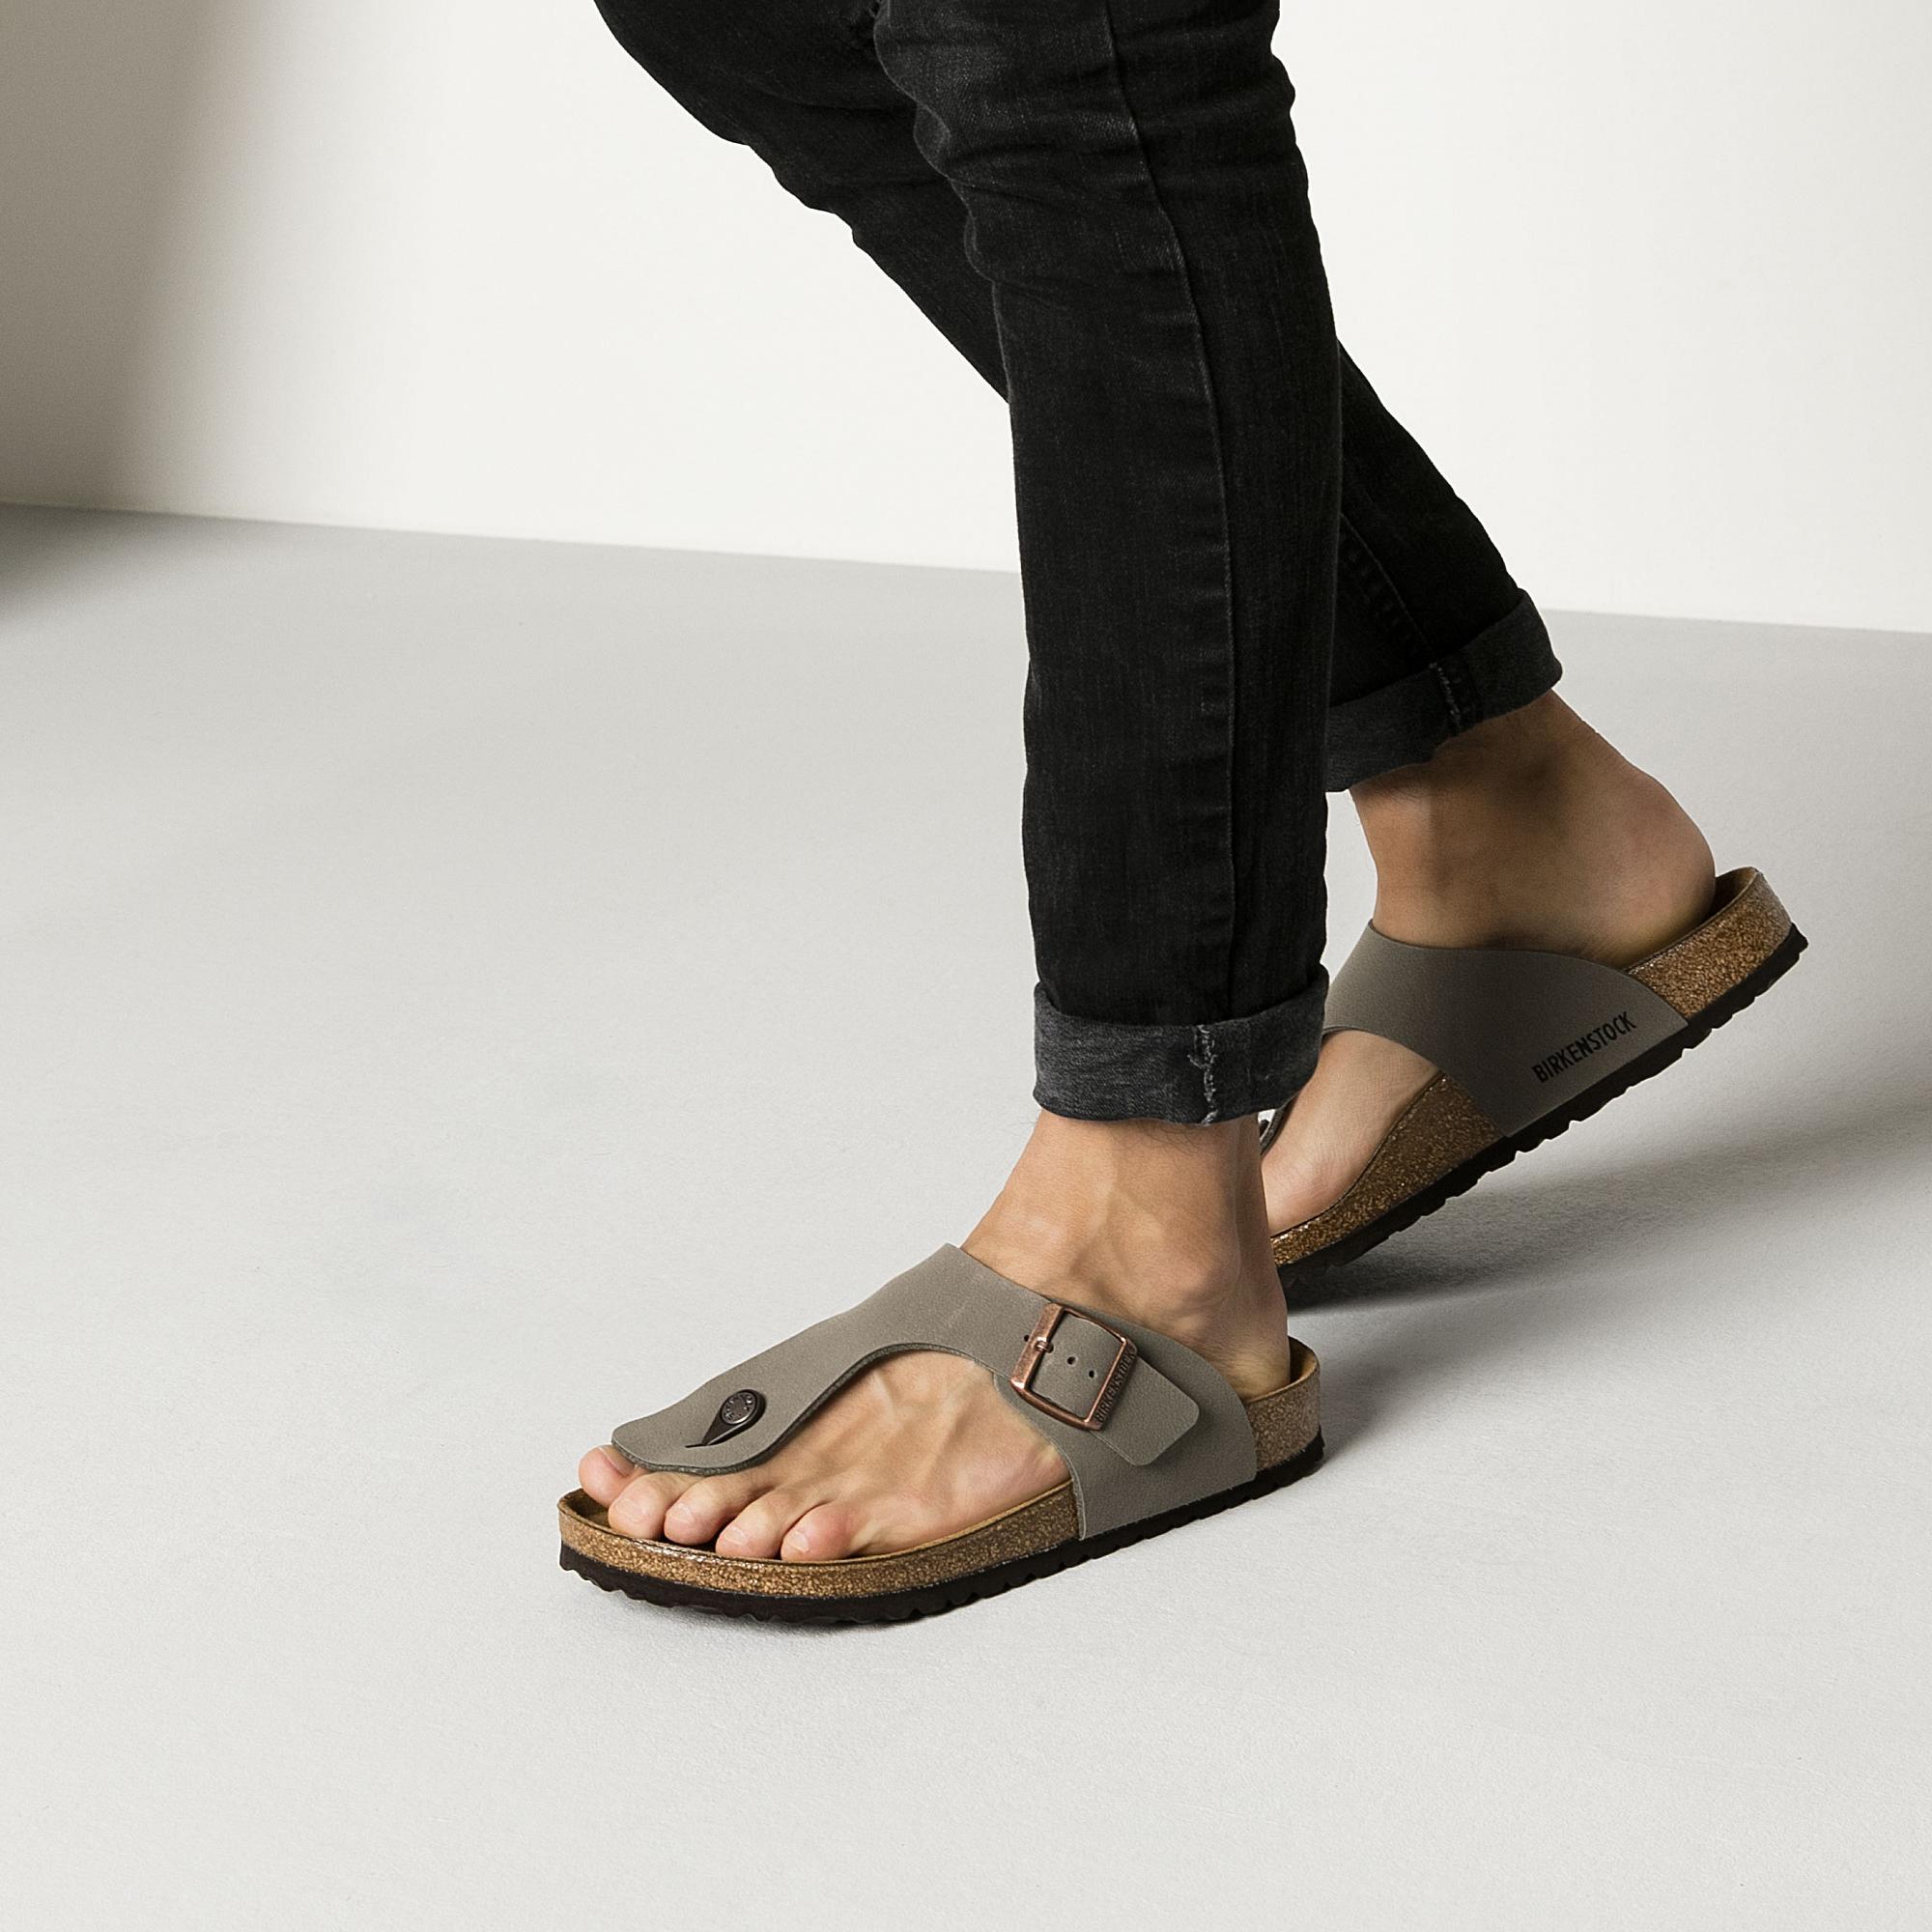 Birkenstock Gizeh Birko Flor Nubuck Sandals Stone